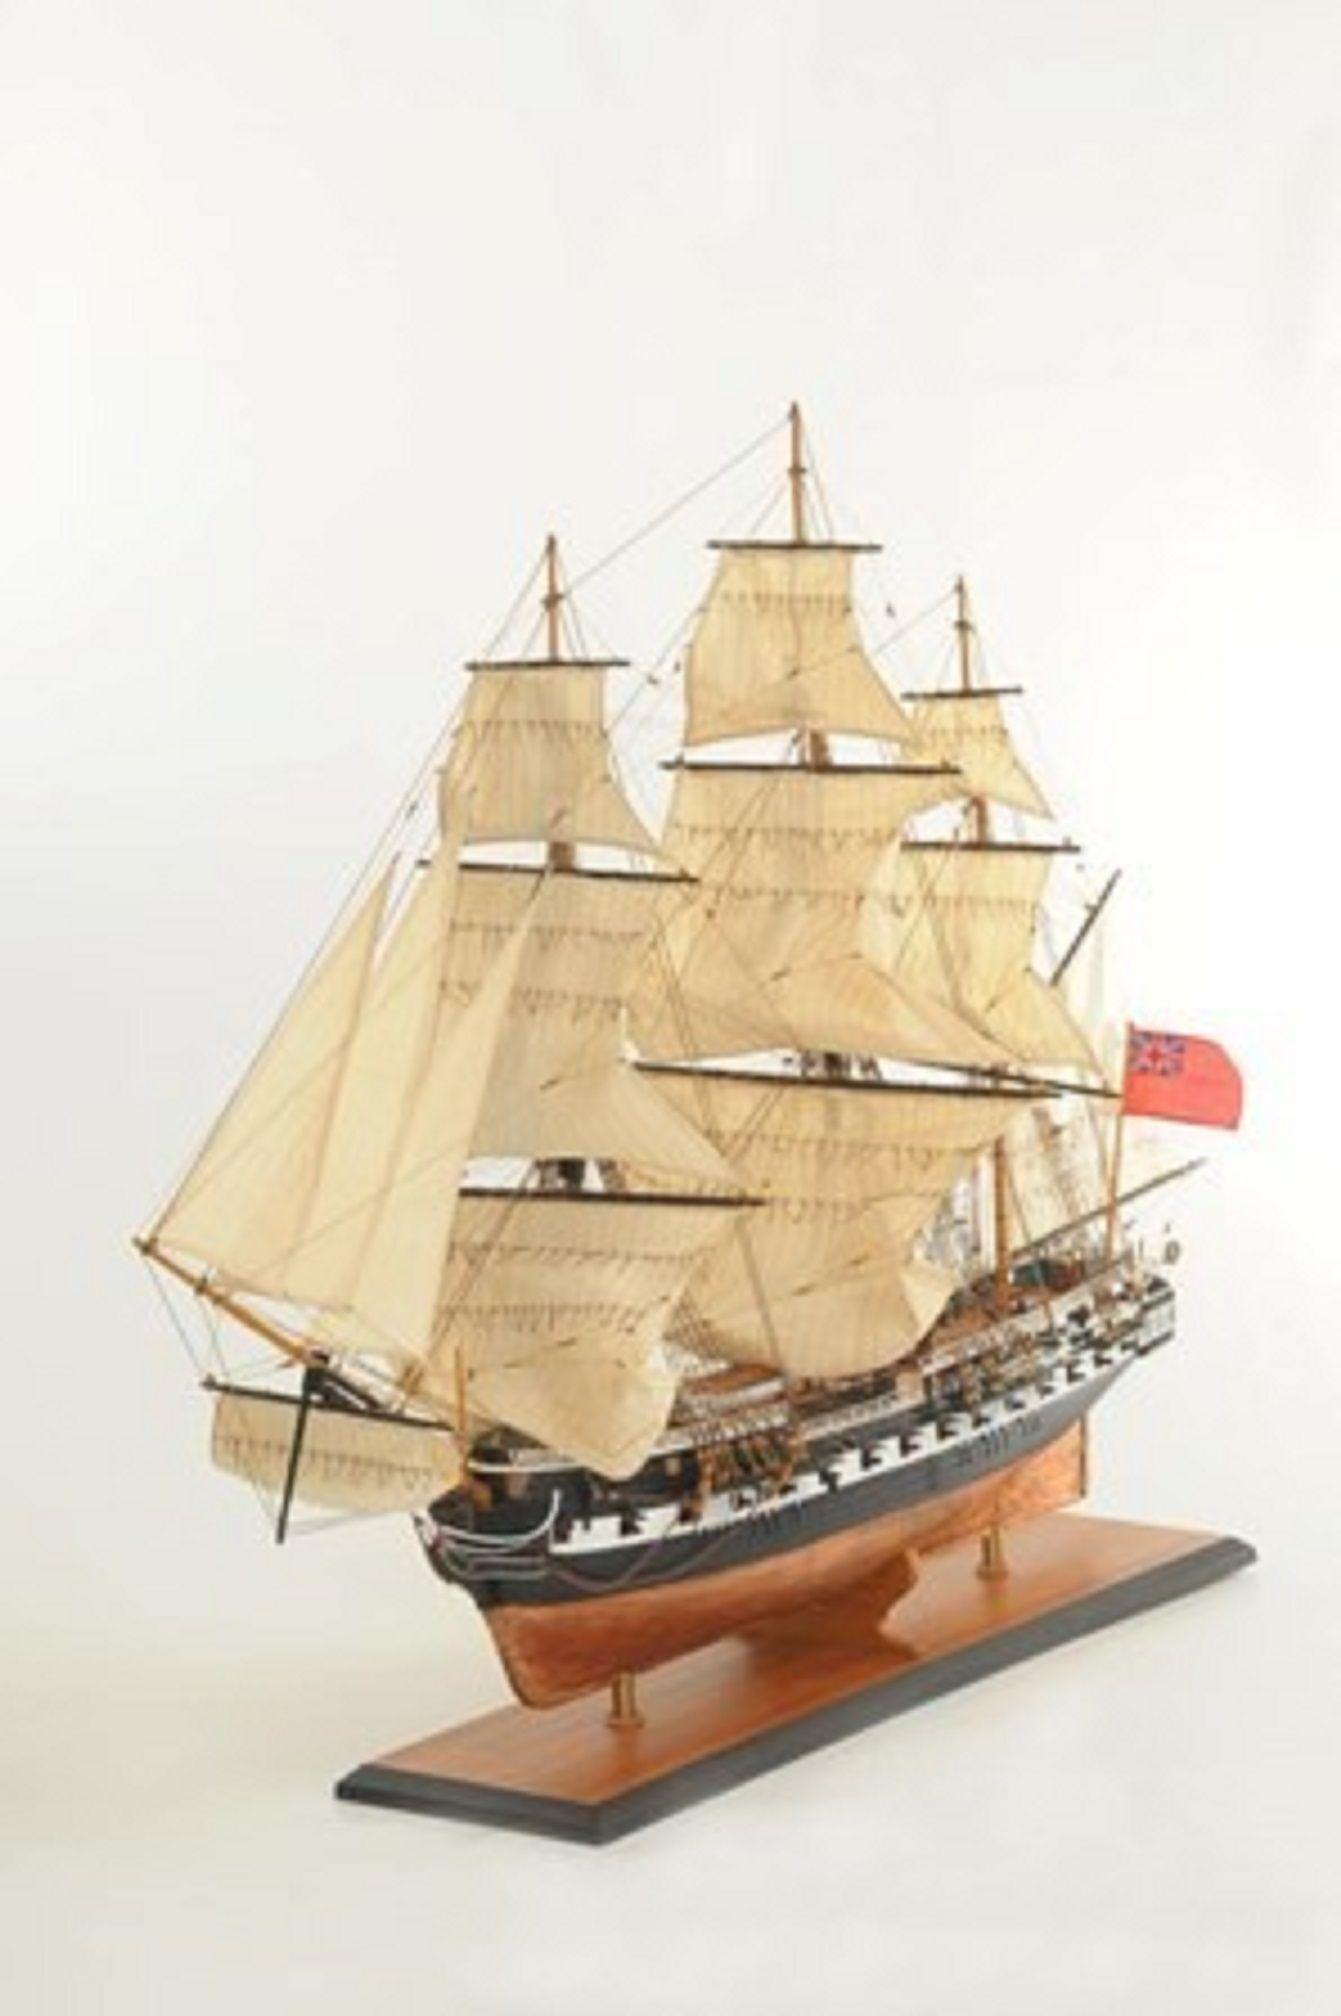 1059-7407-HMS-Trincomalee-Ship-Model-Premier-Range